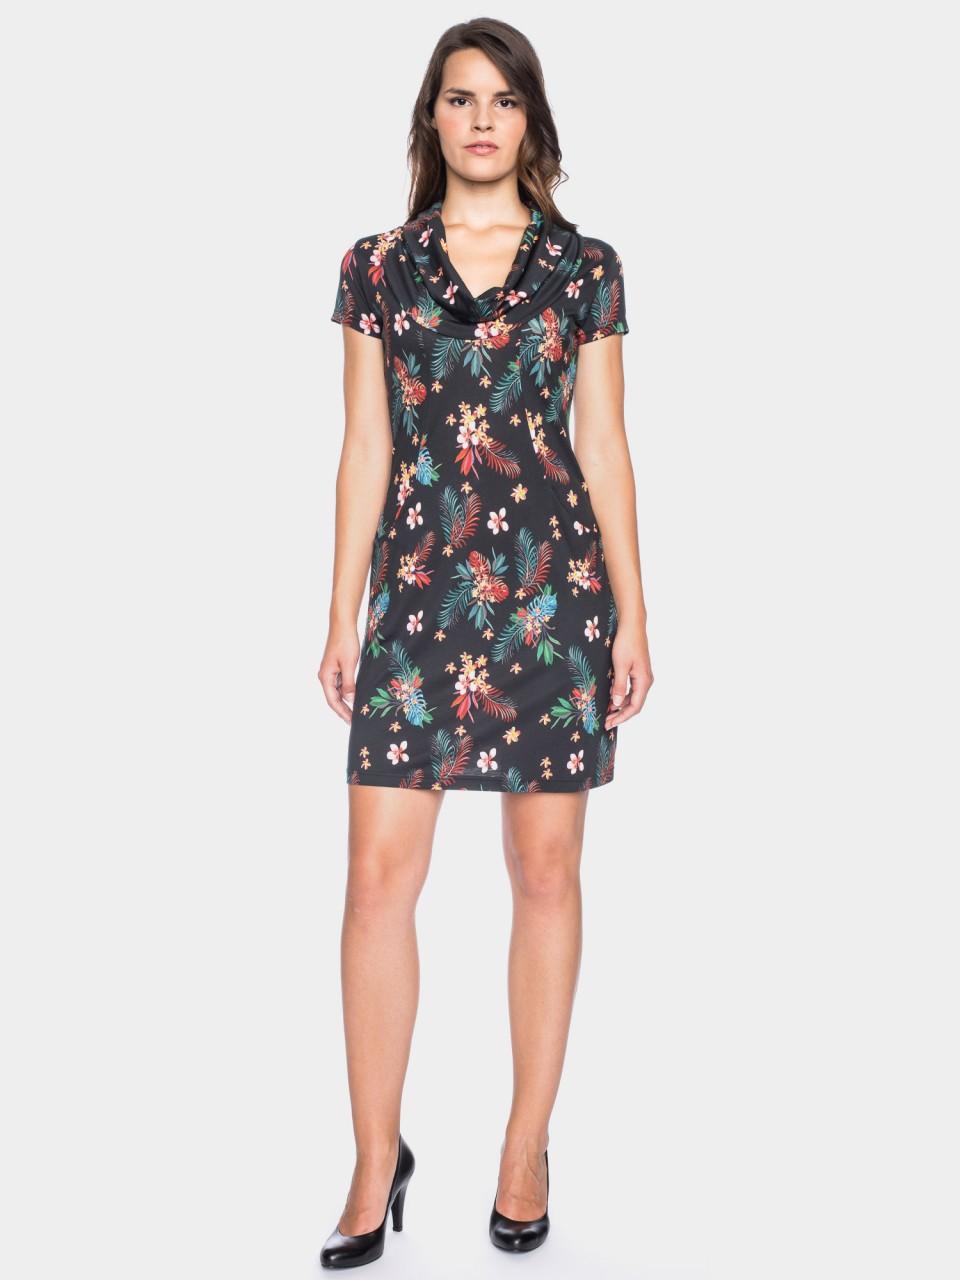 Kleid Erbse CLY/CO 14/024 BLK/MULTI